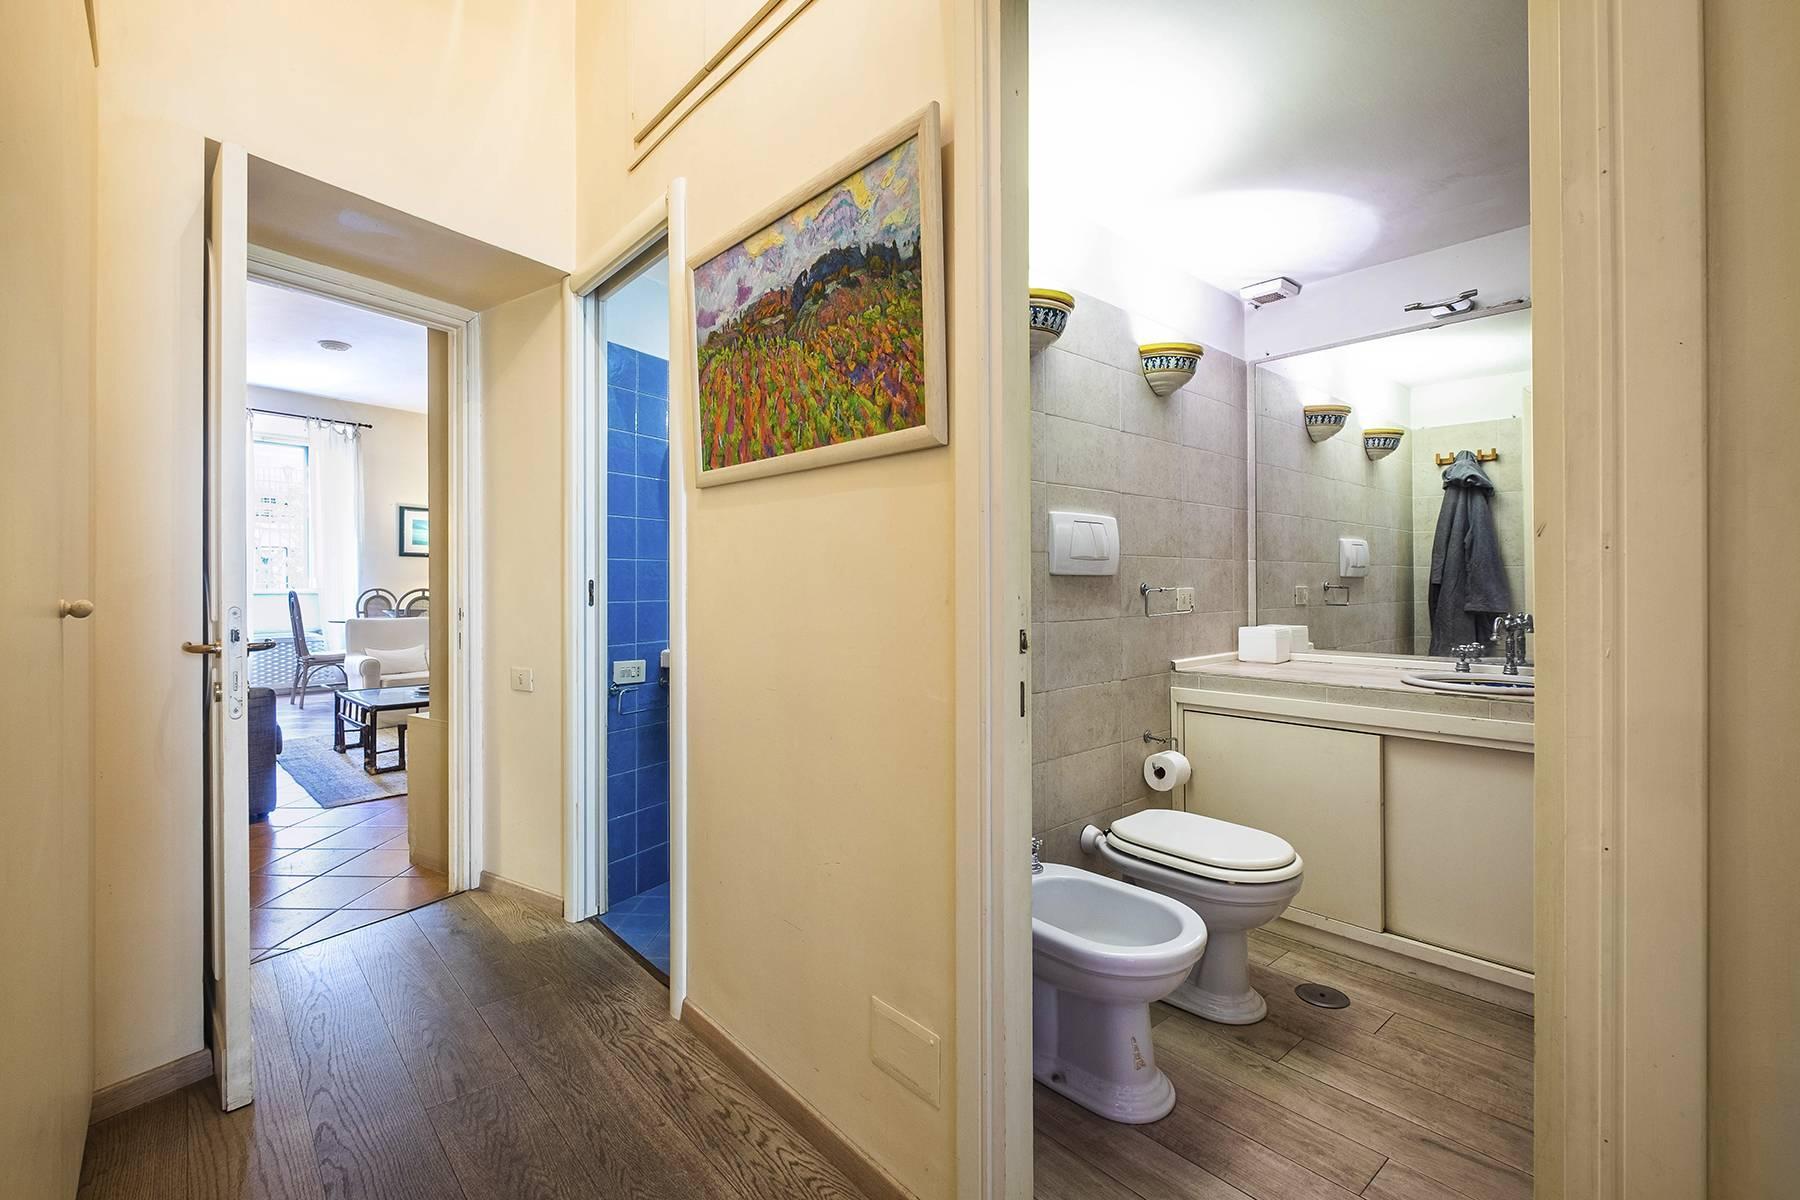 Affascinante appartamento a due passi dal Palatino - 10